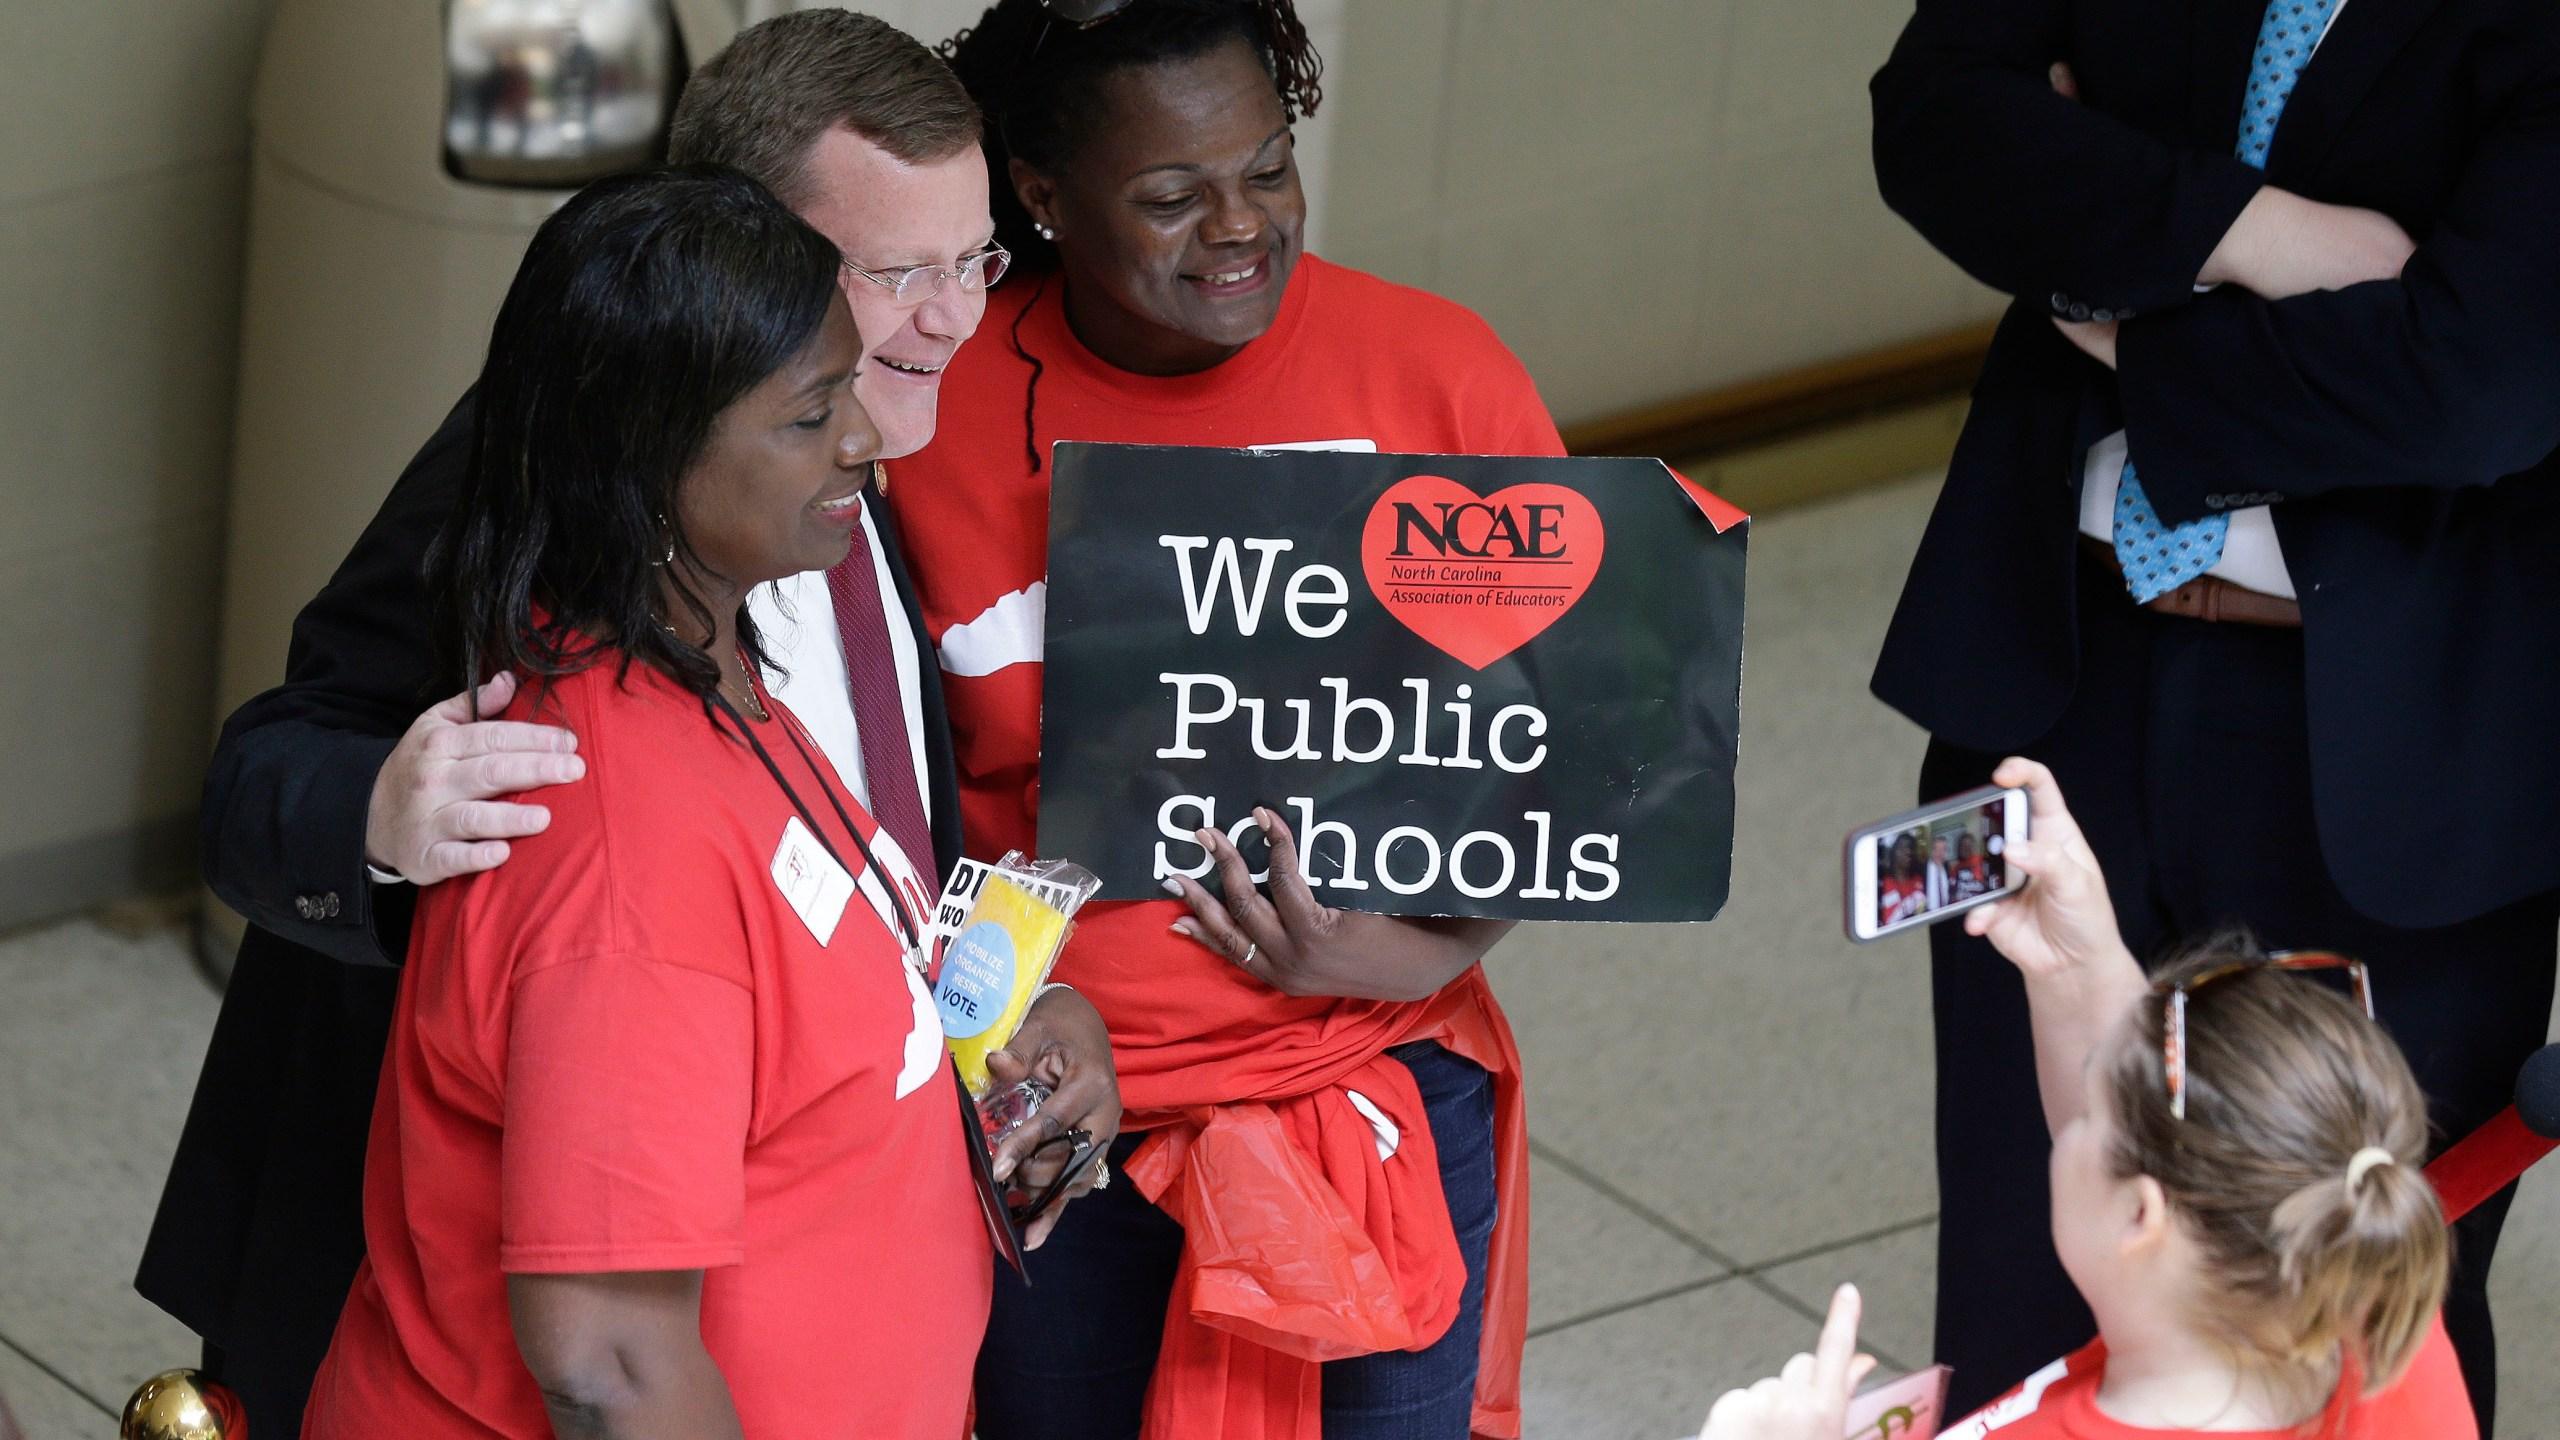 Teacher_Protests_North_Carolina_16447-159532.jpg21275705